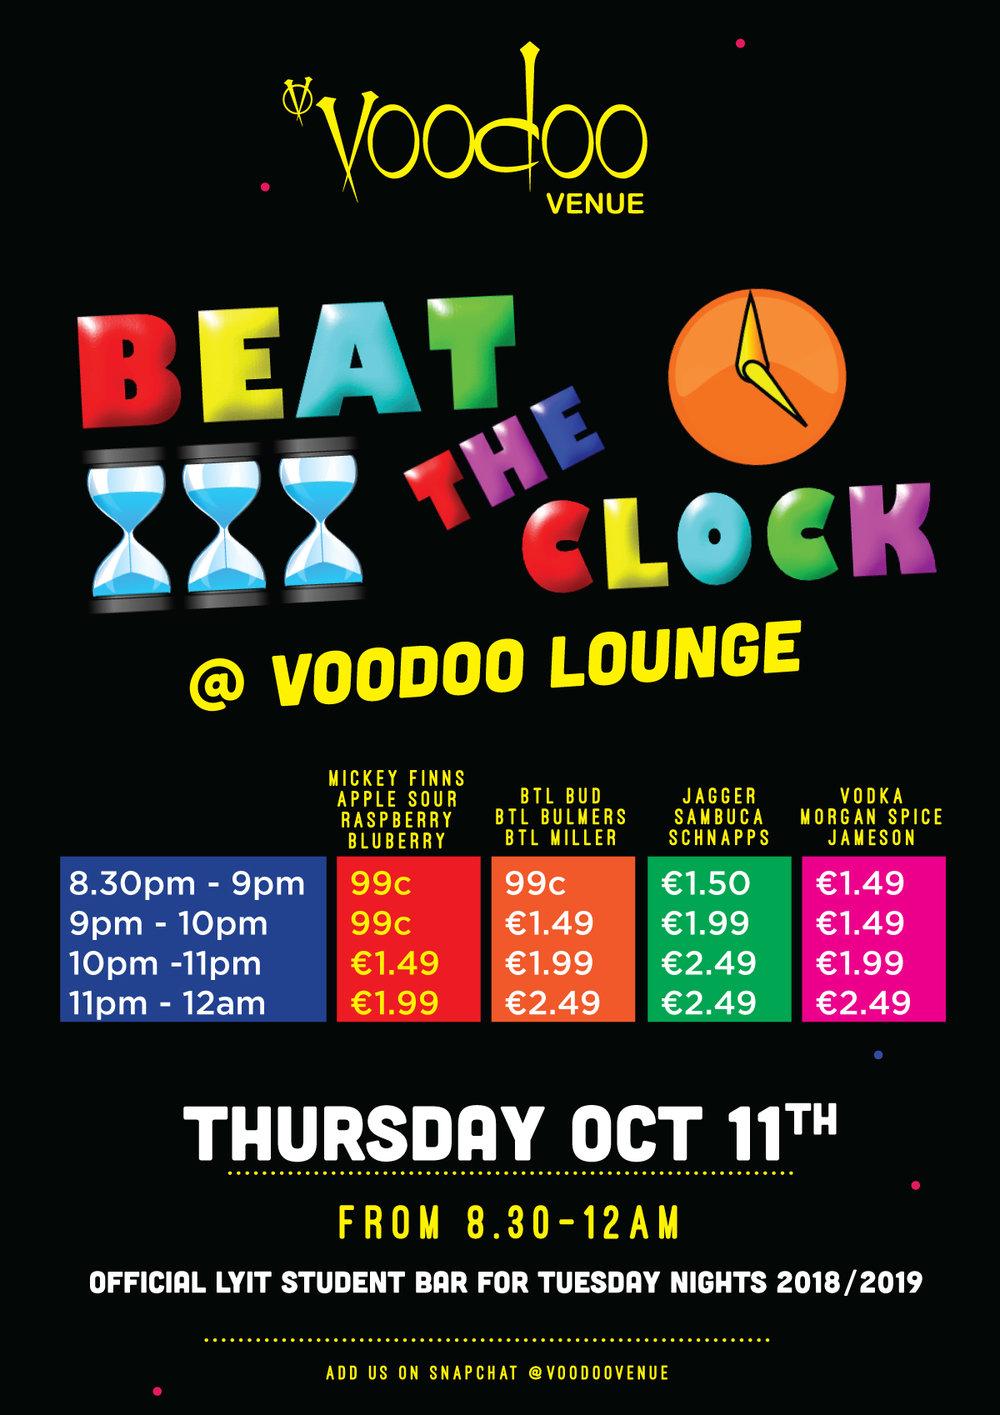 voodoo-lounge---beat-the-clock---thurs-oct-11-2018.jpg